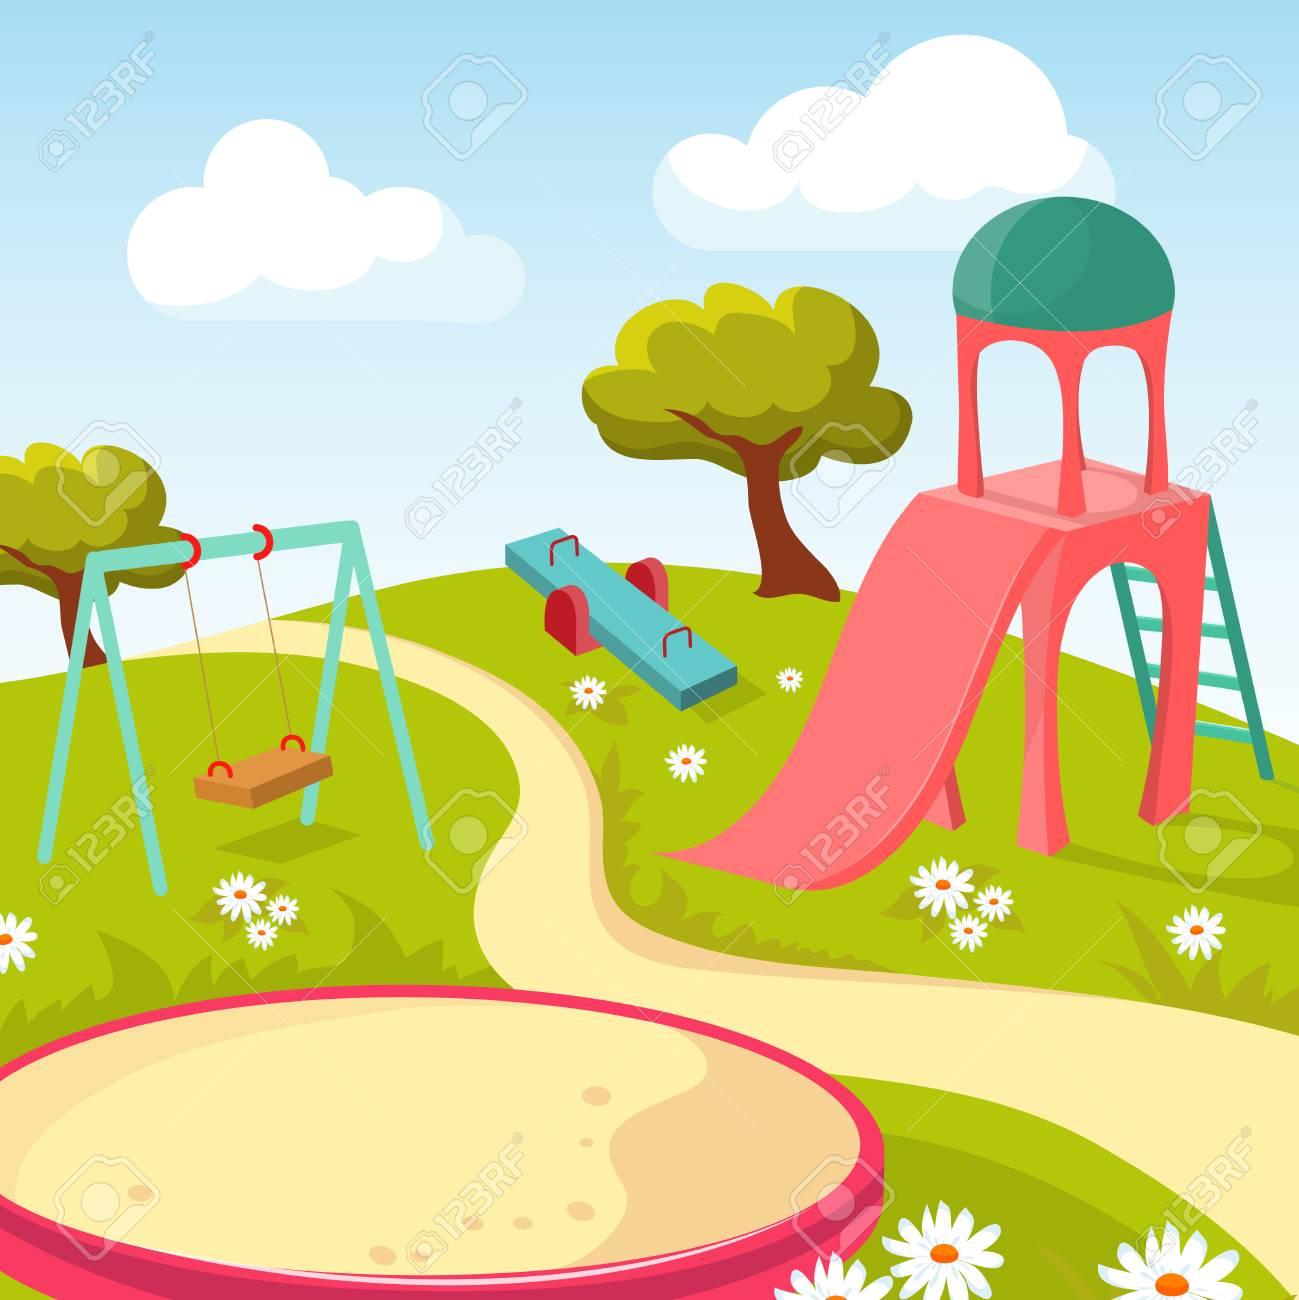 Recreación Parque Infantil Con Equipo De Juego Ilustración Vectorial Parque Infantil Para Juegos Recreativos